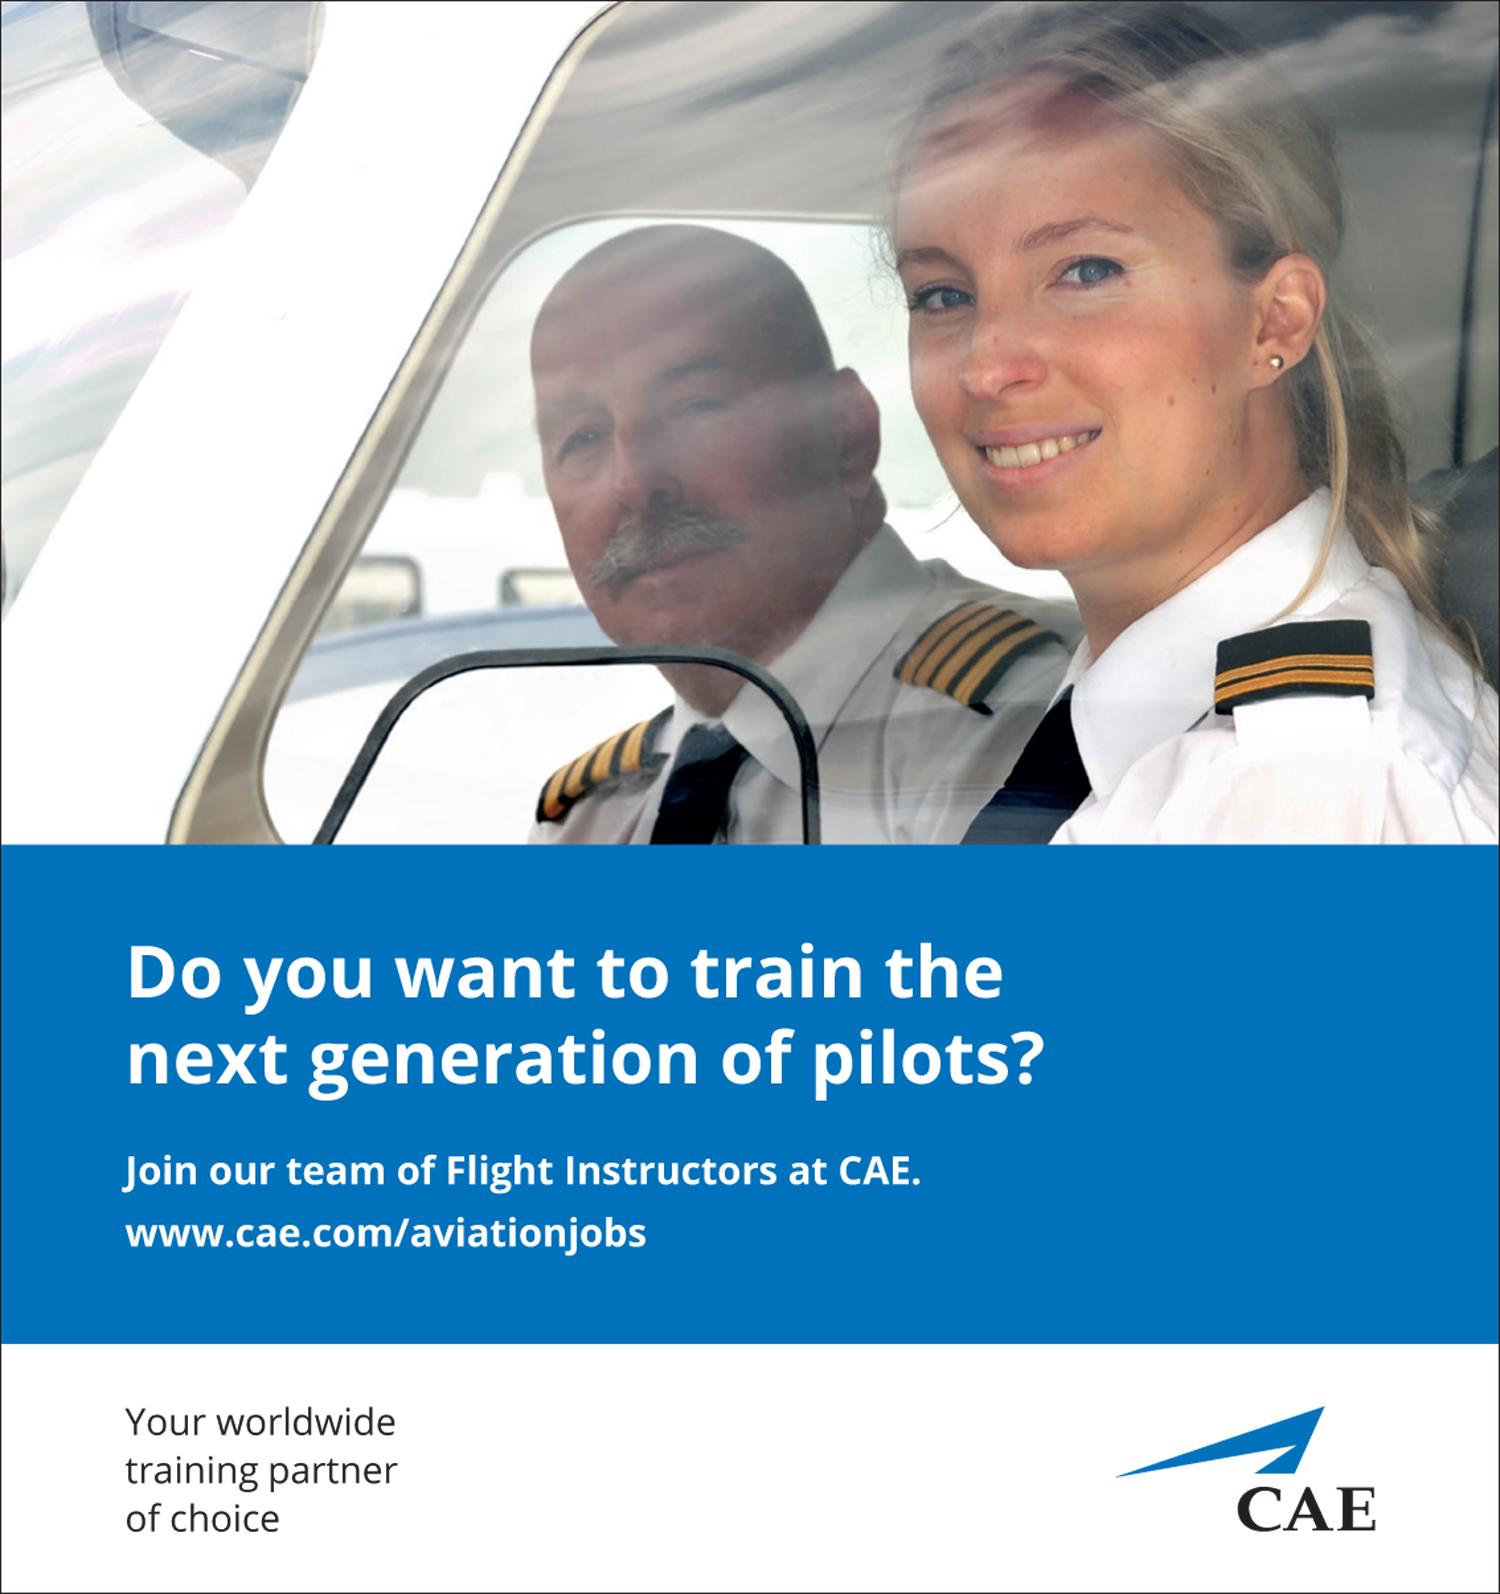 CAE instructors